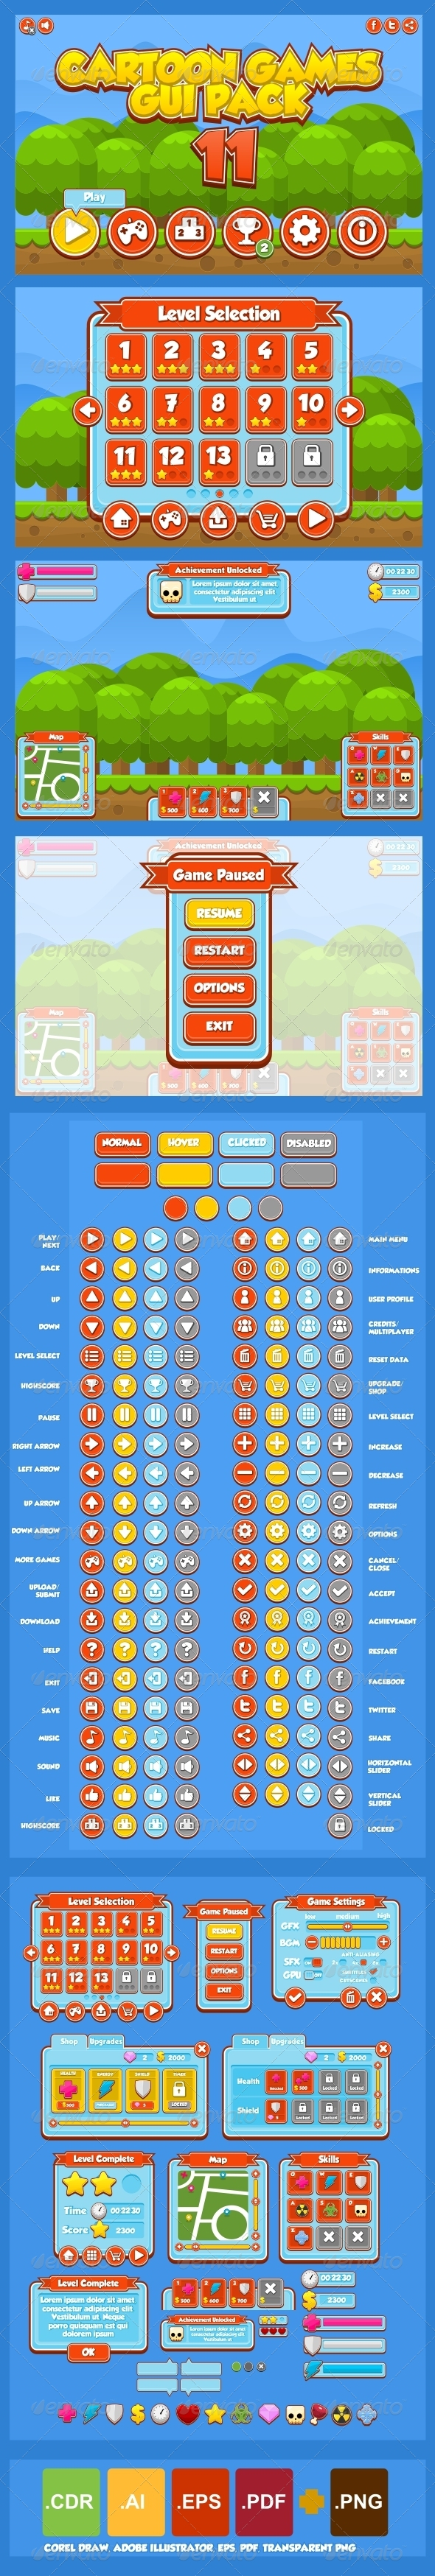 GraphicRiver Cartoon Games GUI Pack 11 6056785